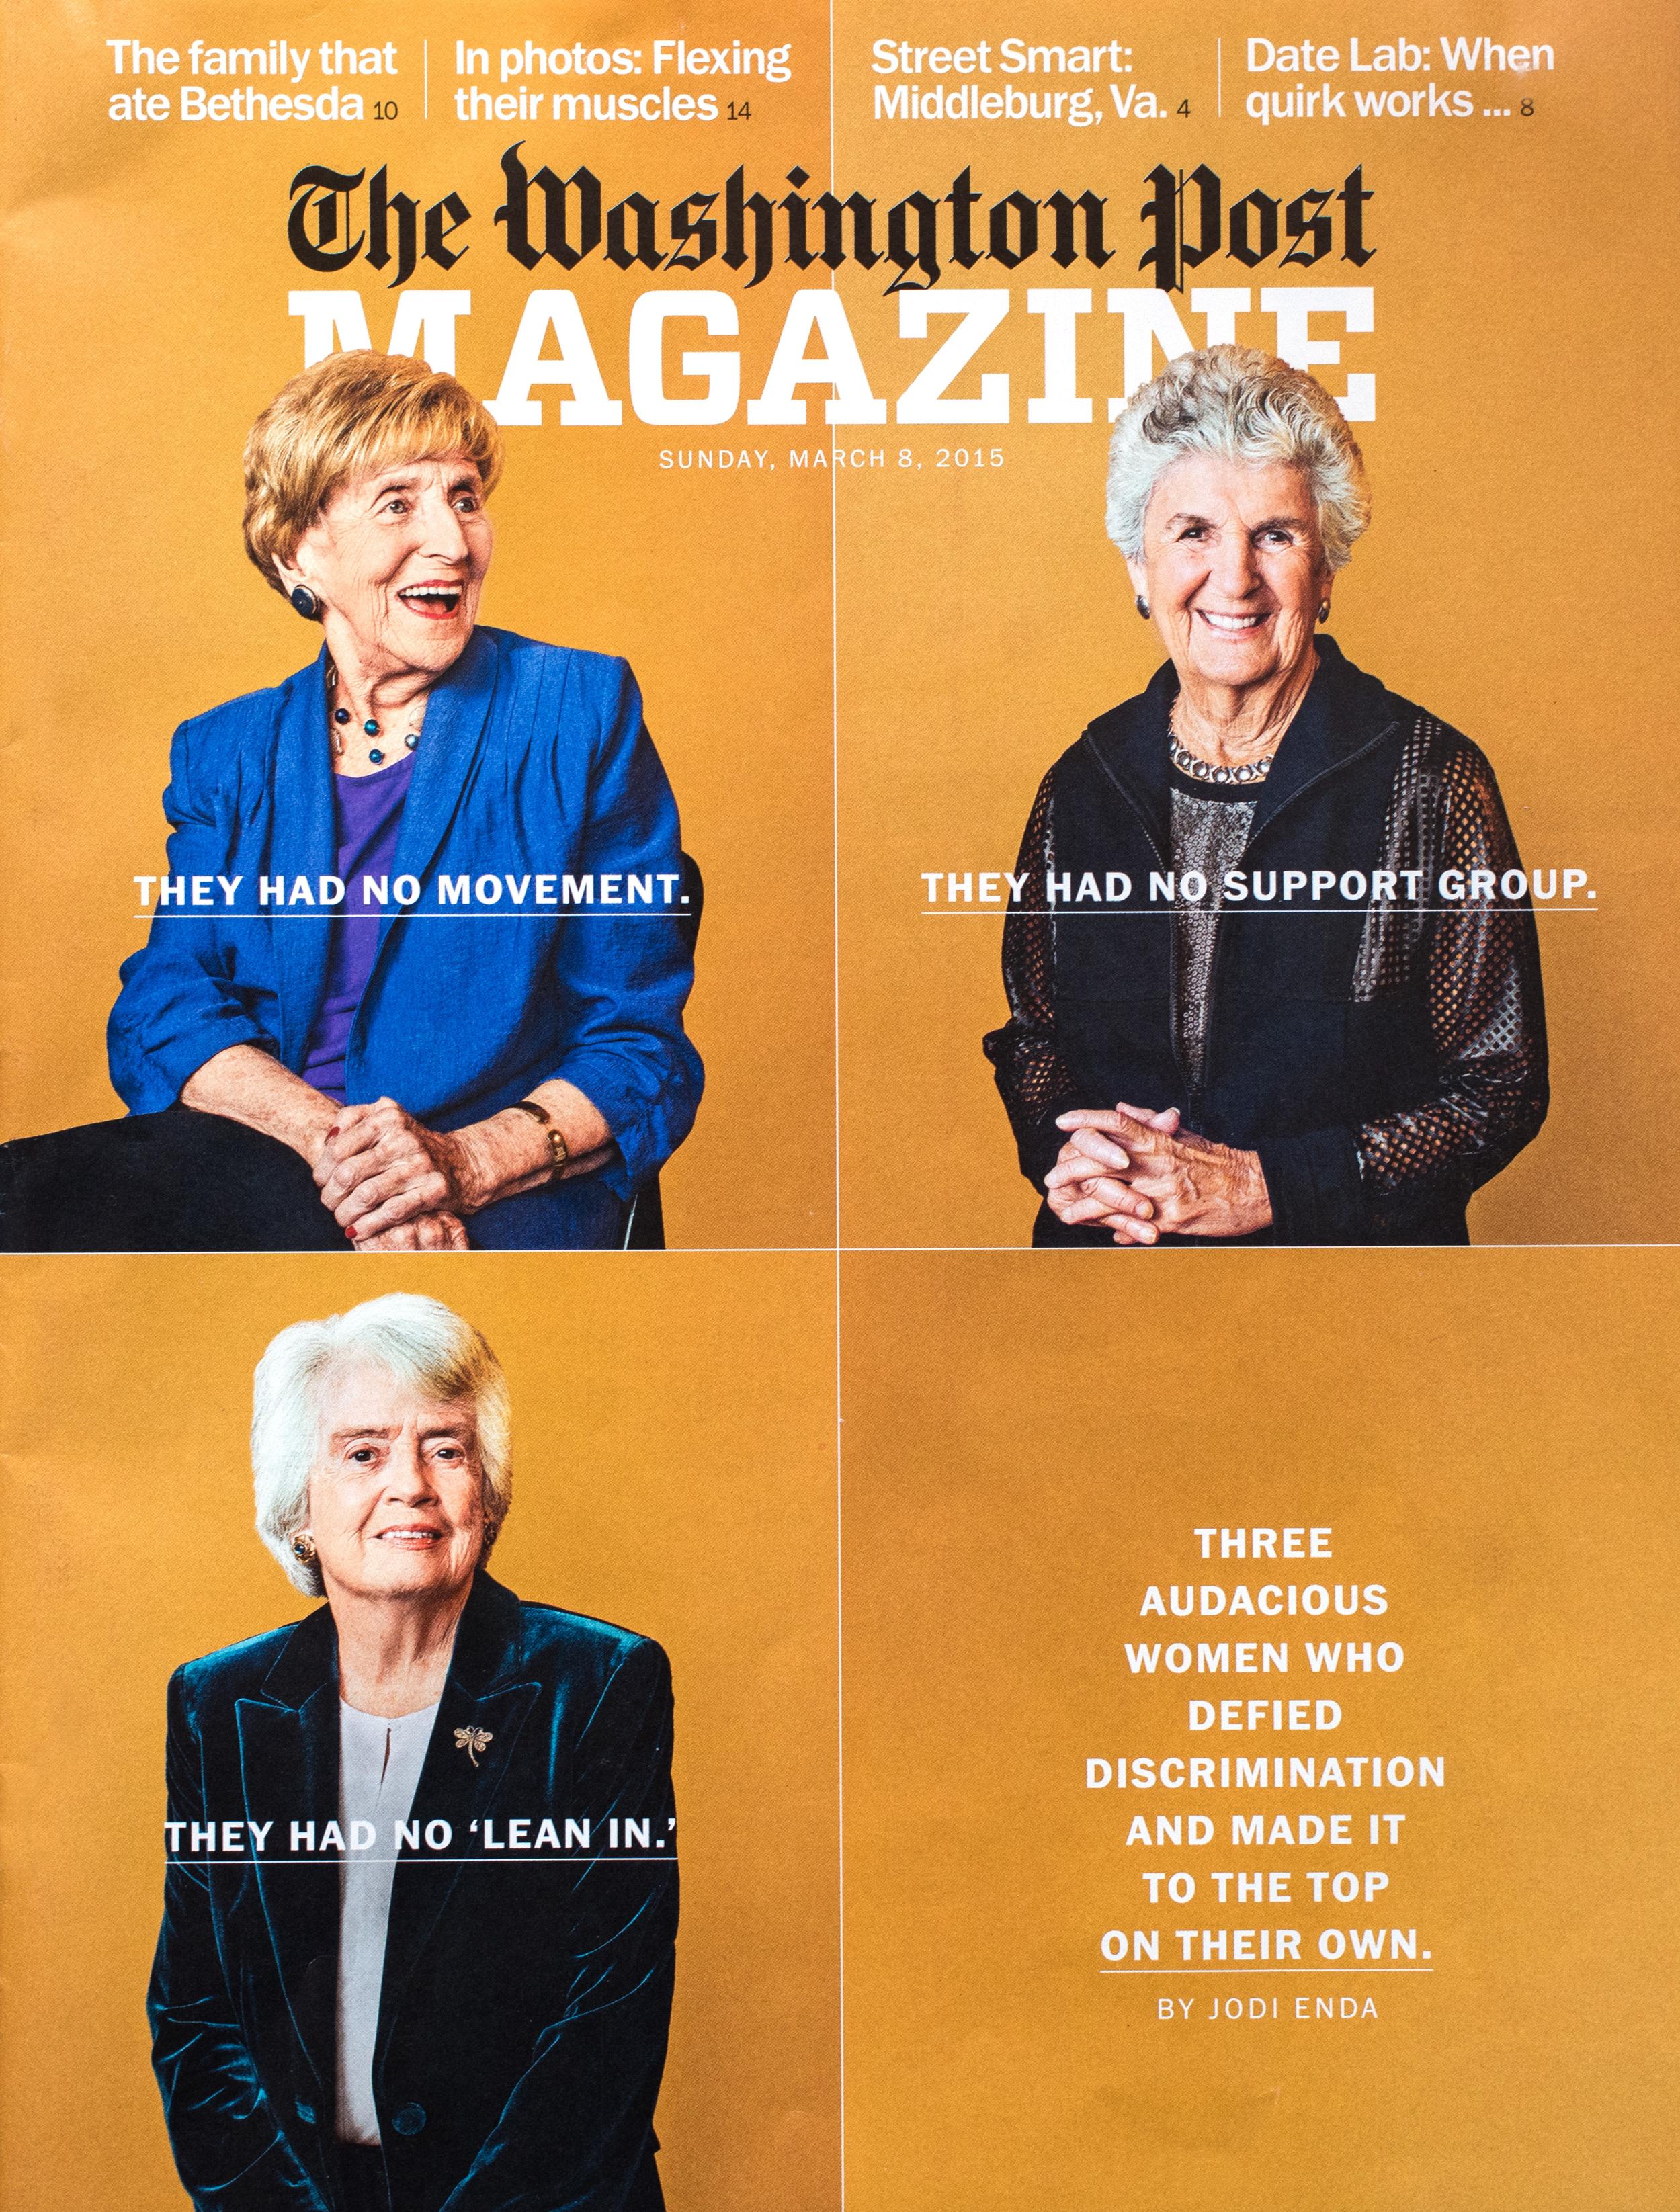 washington-post-magazine-women.jpg